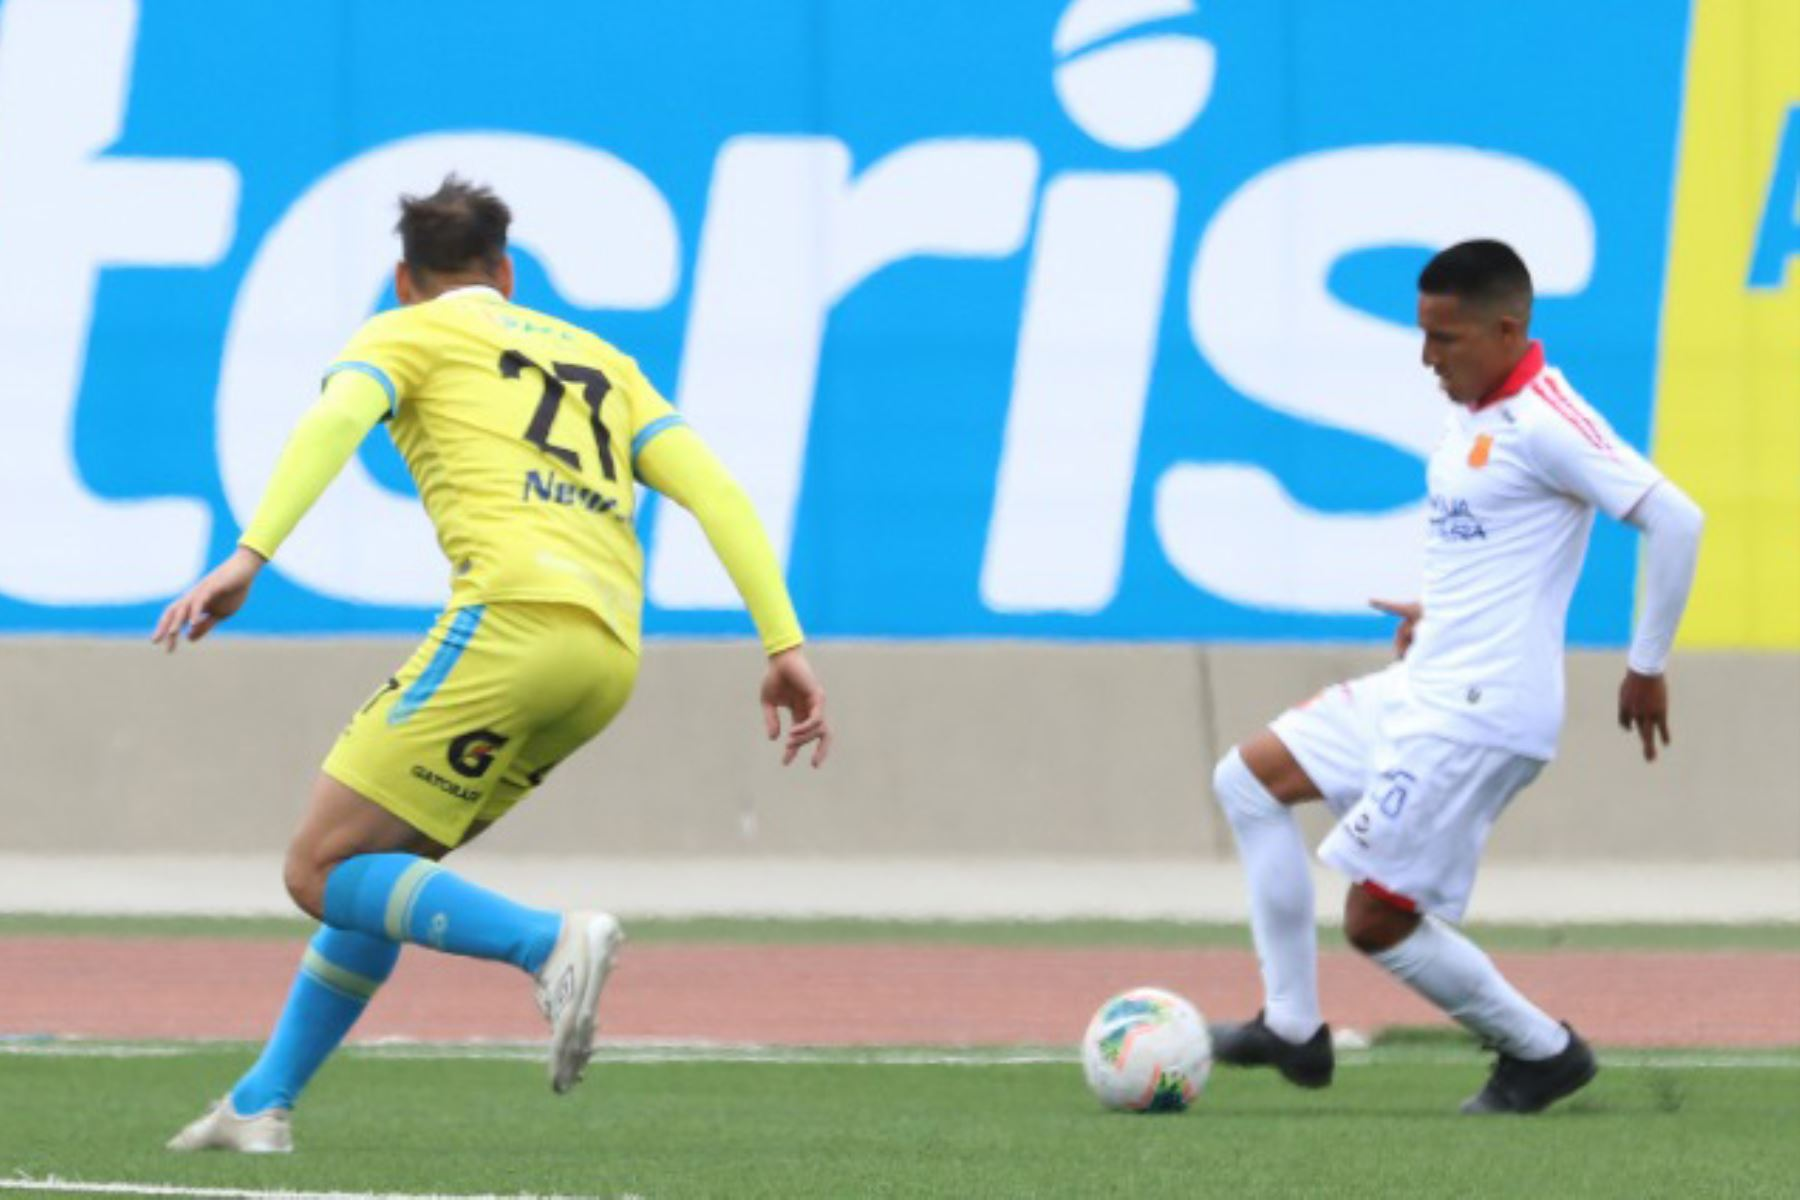 Club Carlos Stein se enfrenta al Atlético Grau por la jornada 12 de la Liga 1 que se disputa en el estadio San Marcos.  Foto: @LigaFutProf